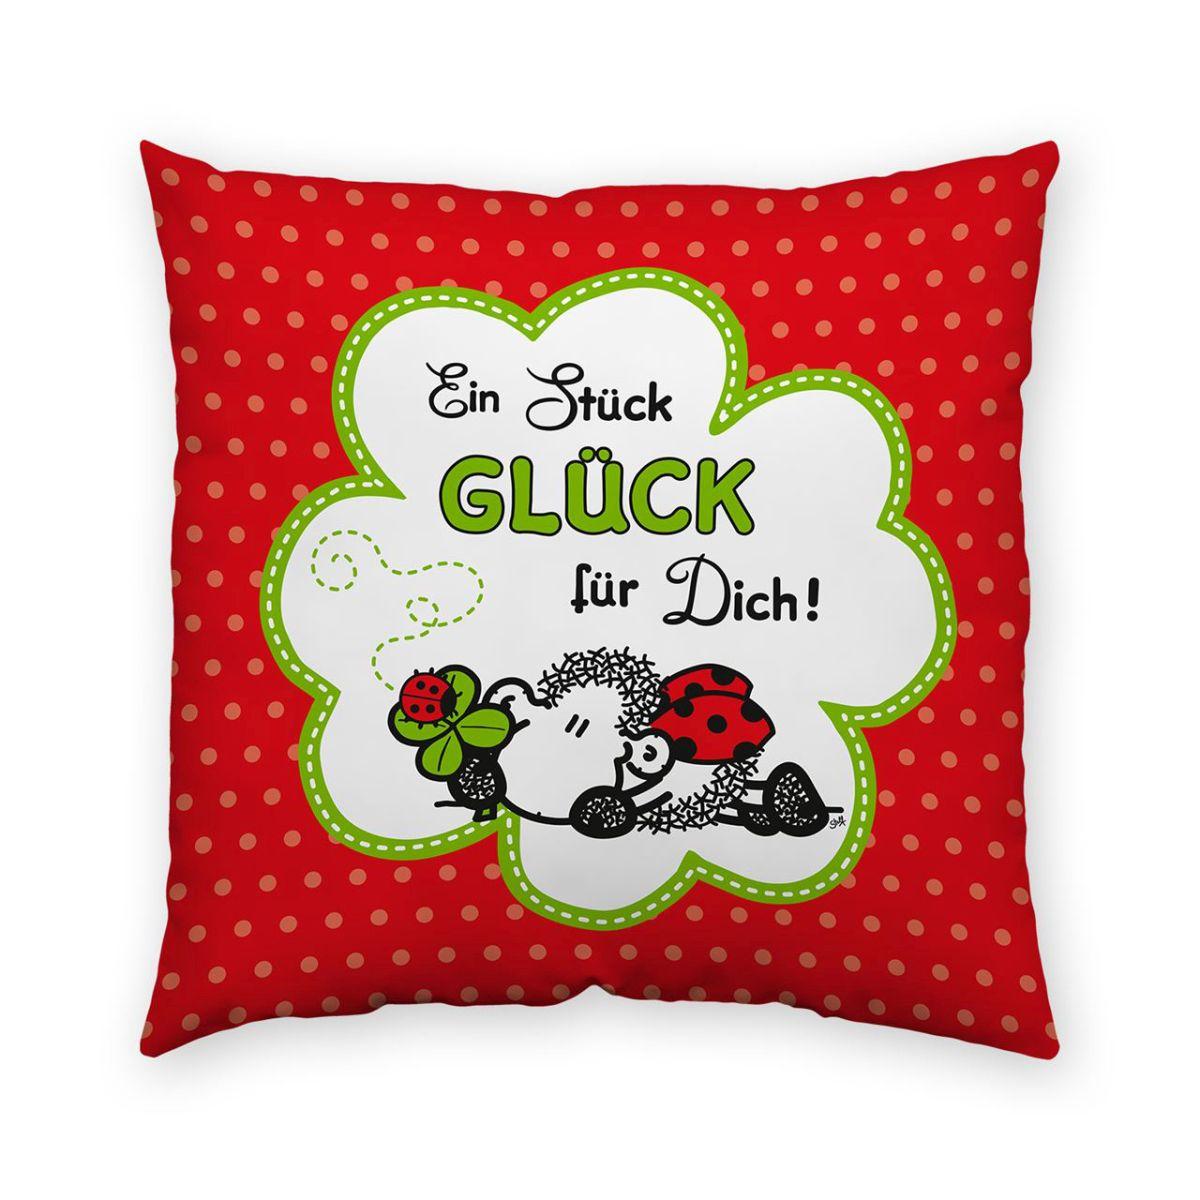 sheepworld kissen gl ck dekokissen sofakissen zierkissen valentinstag 40 x 40 ebay. Black Bedroom Furniture Sets. Home Design Ideas